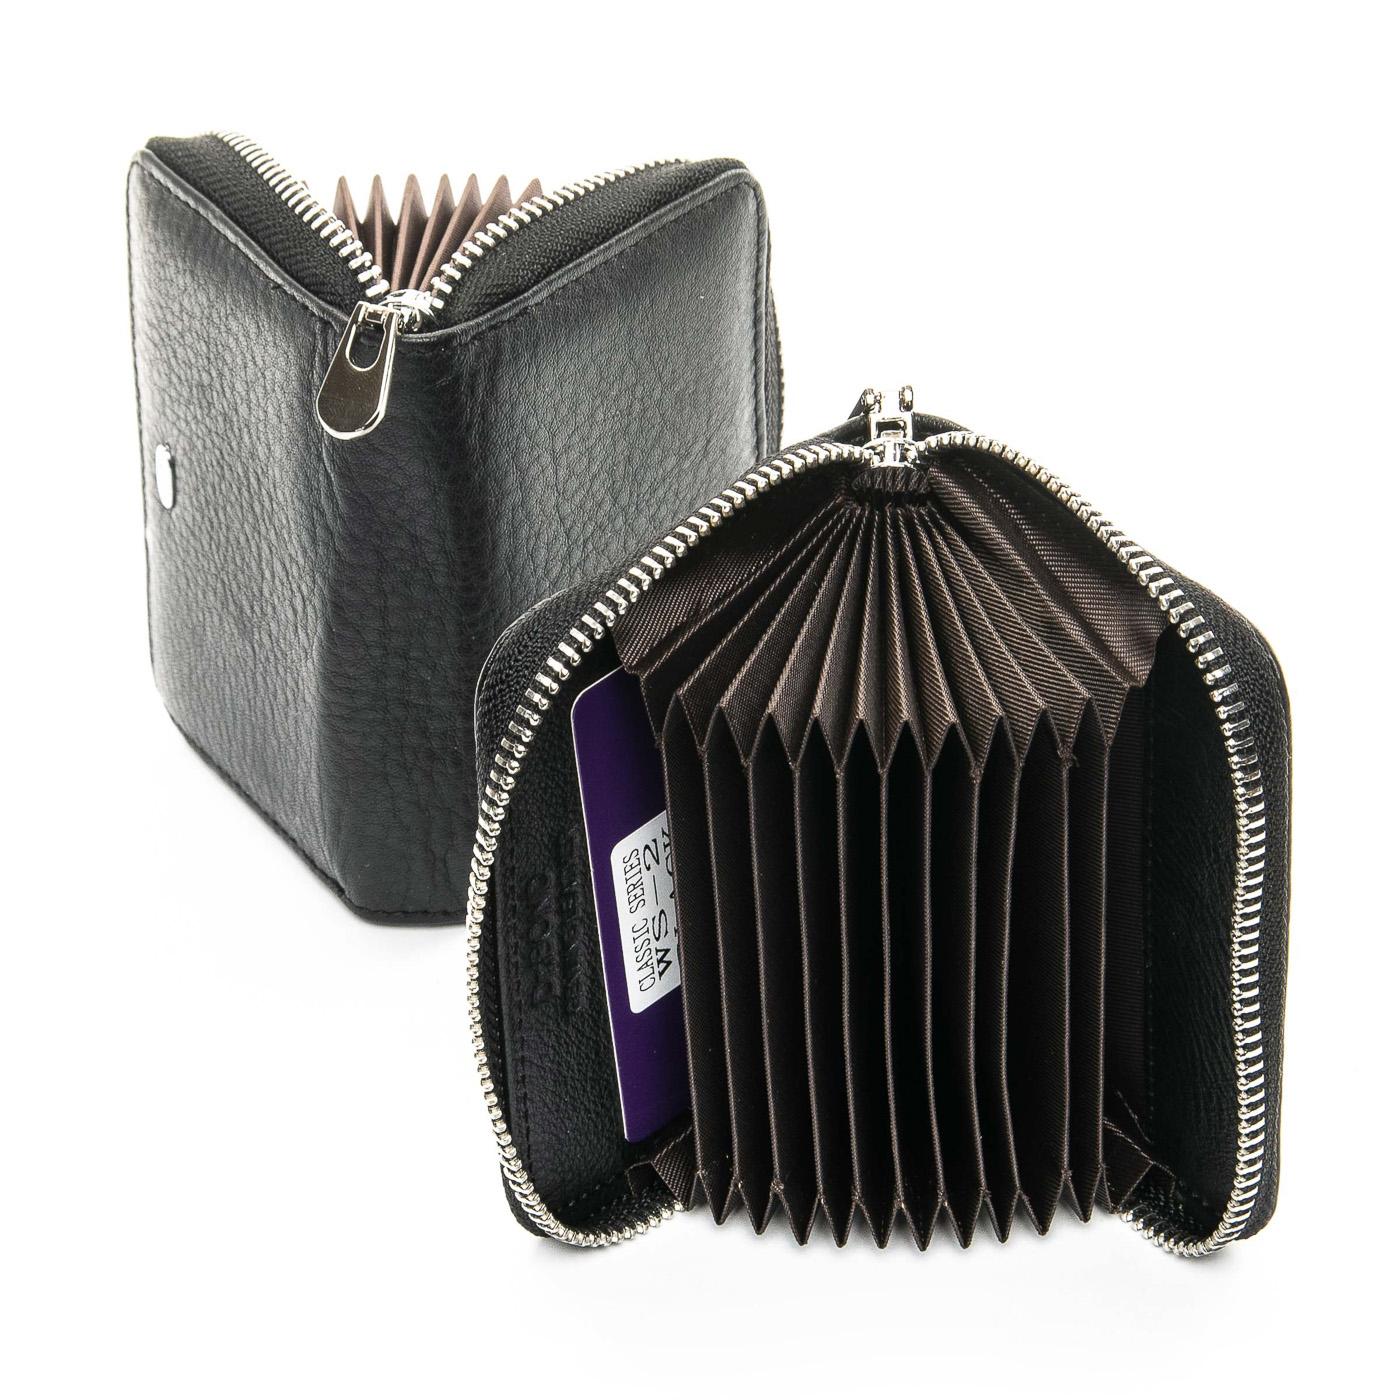 Кошелек Classic кожа DR. BOND WS-2 black цв коробка - фото 4